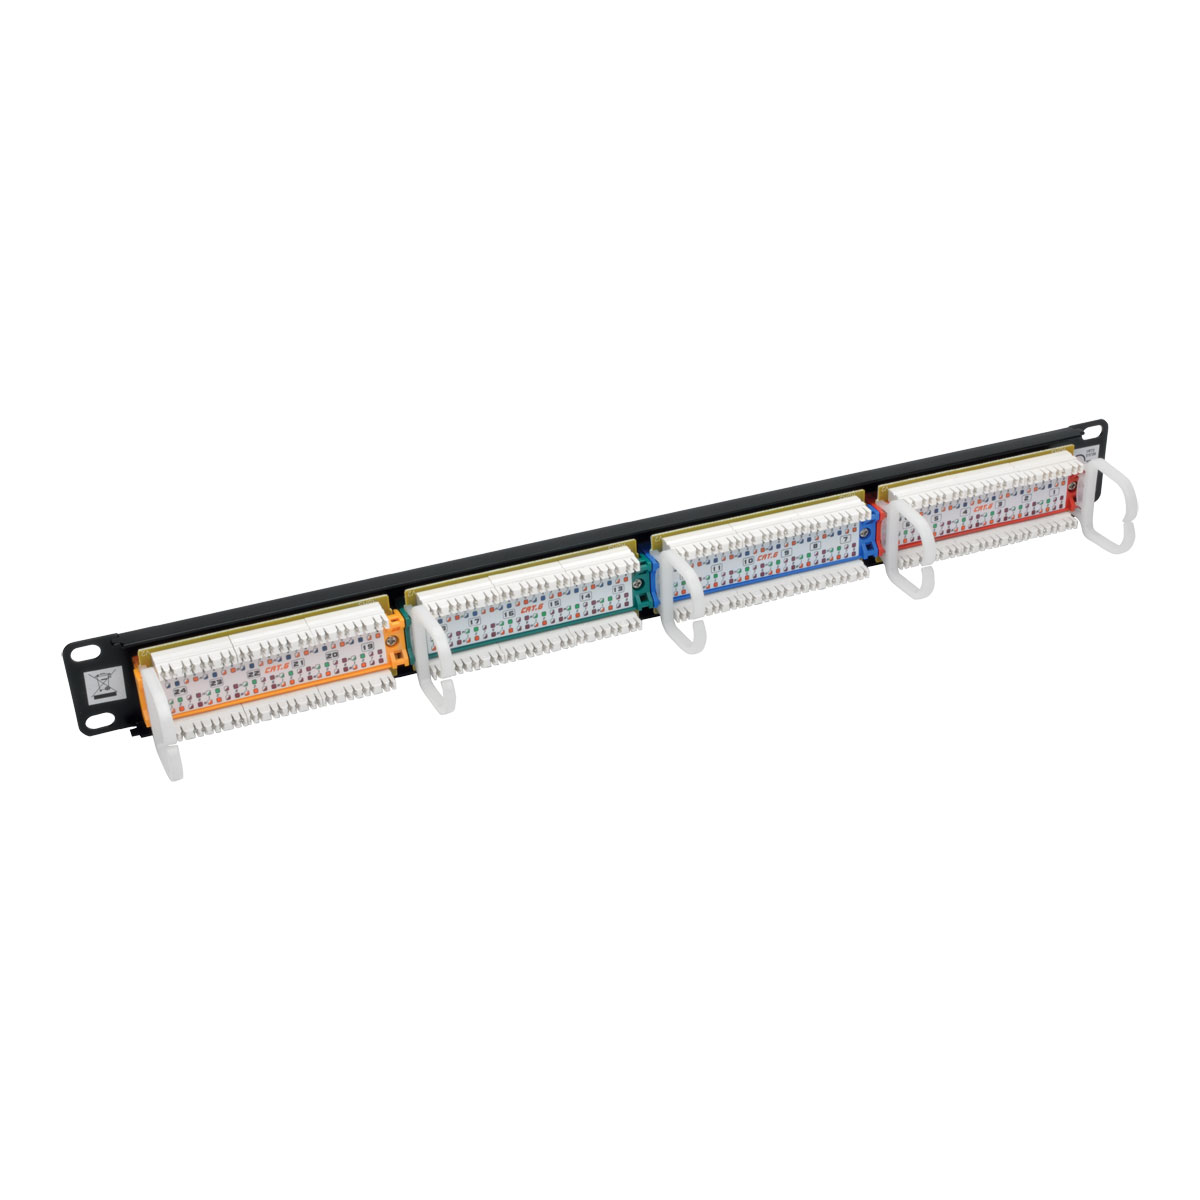 Provantage Tripp Lite N253 024 Rbgy 24 Port Cat6 Patch Panel 1urm 568b Wiring Color Coded 110 Rj45 Ethernet